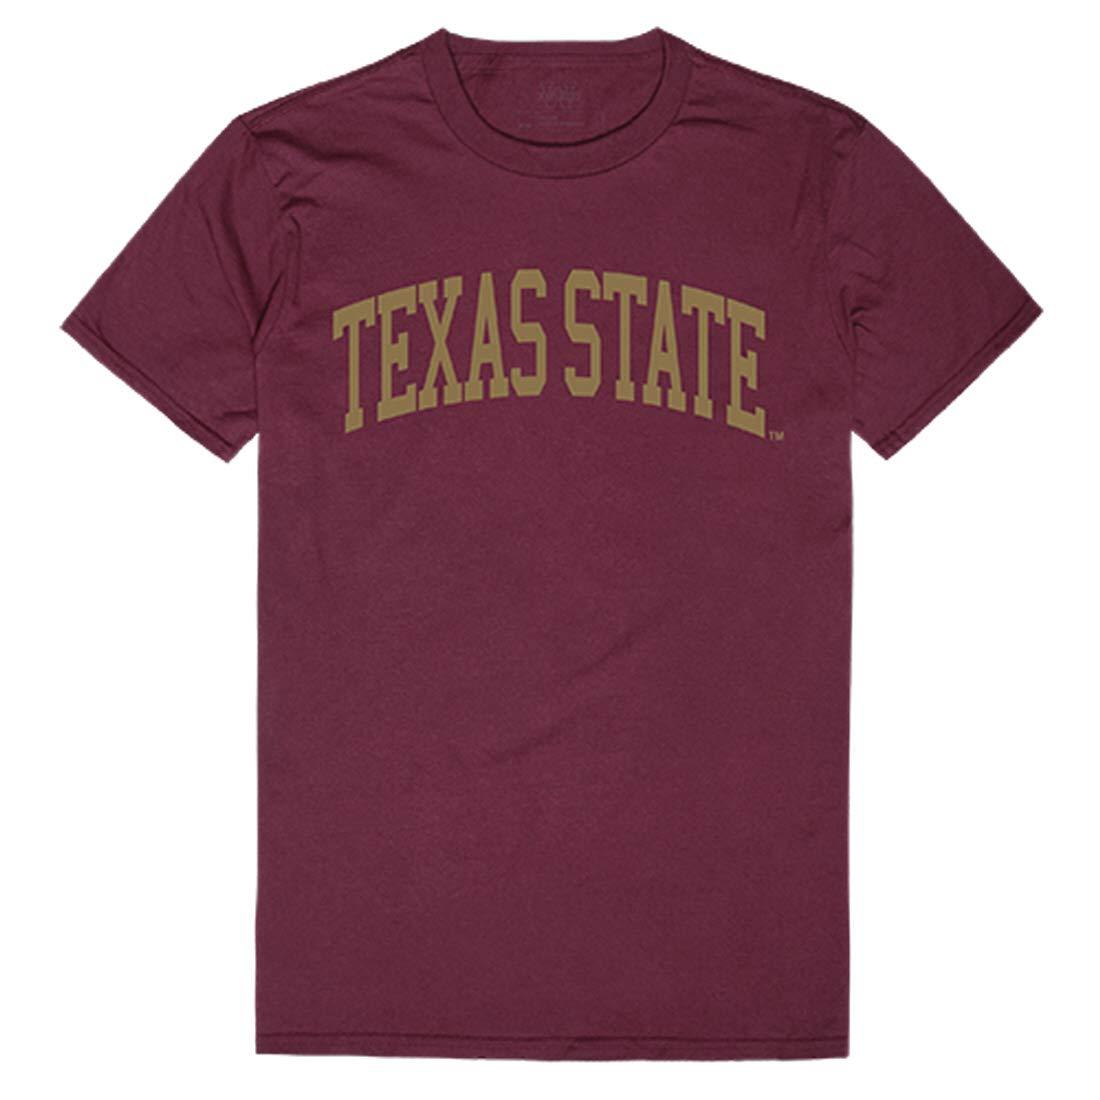 Texas State University College Tee T Shirt